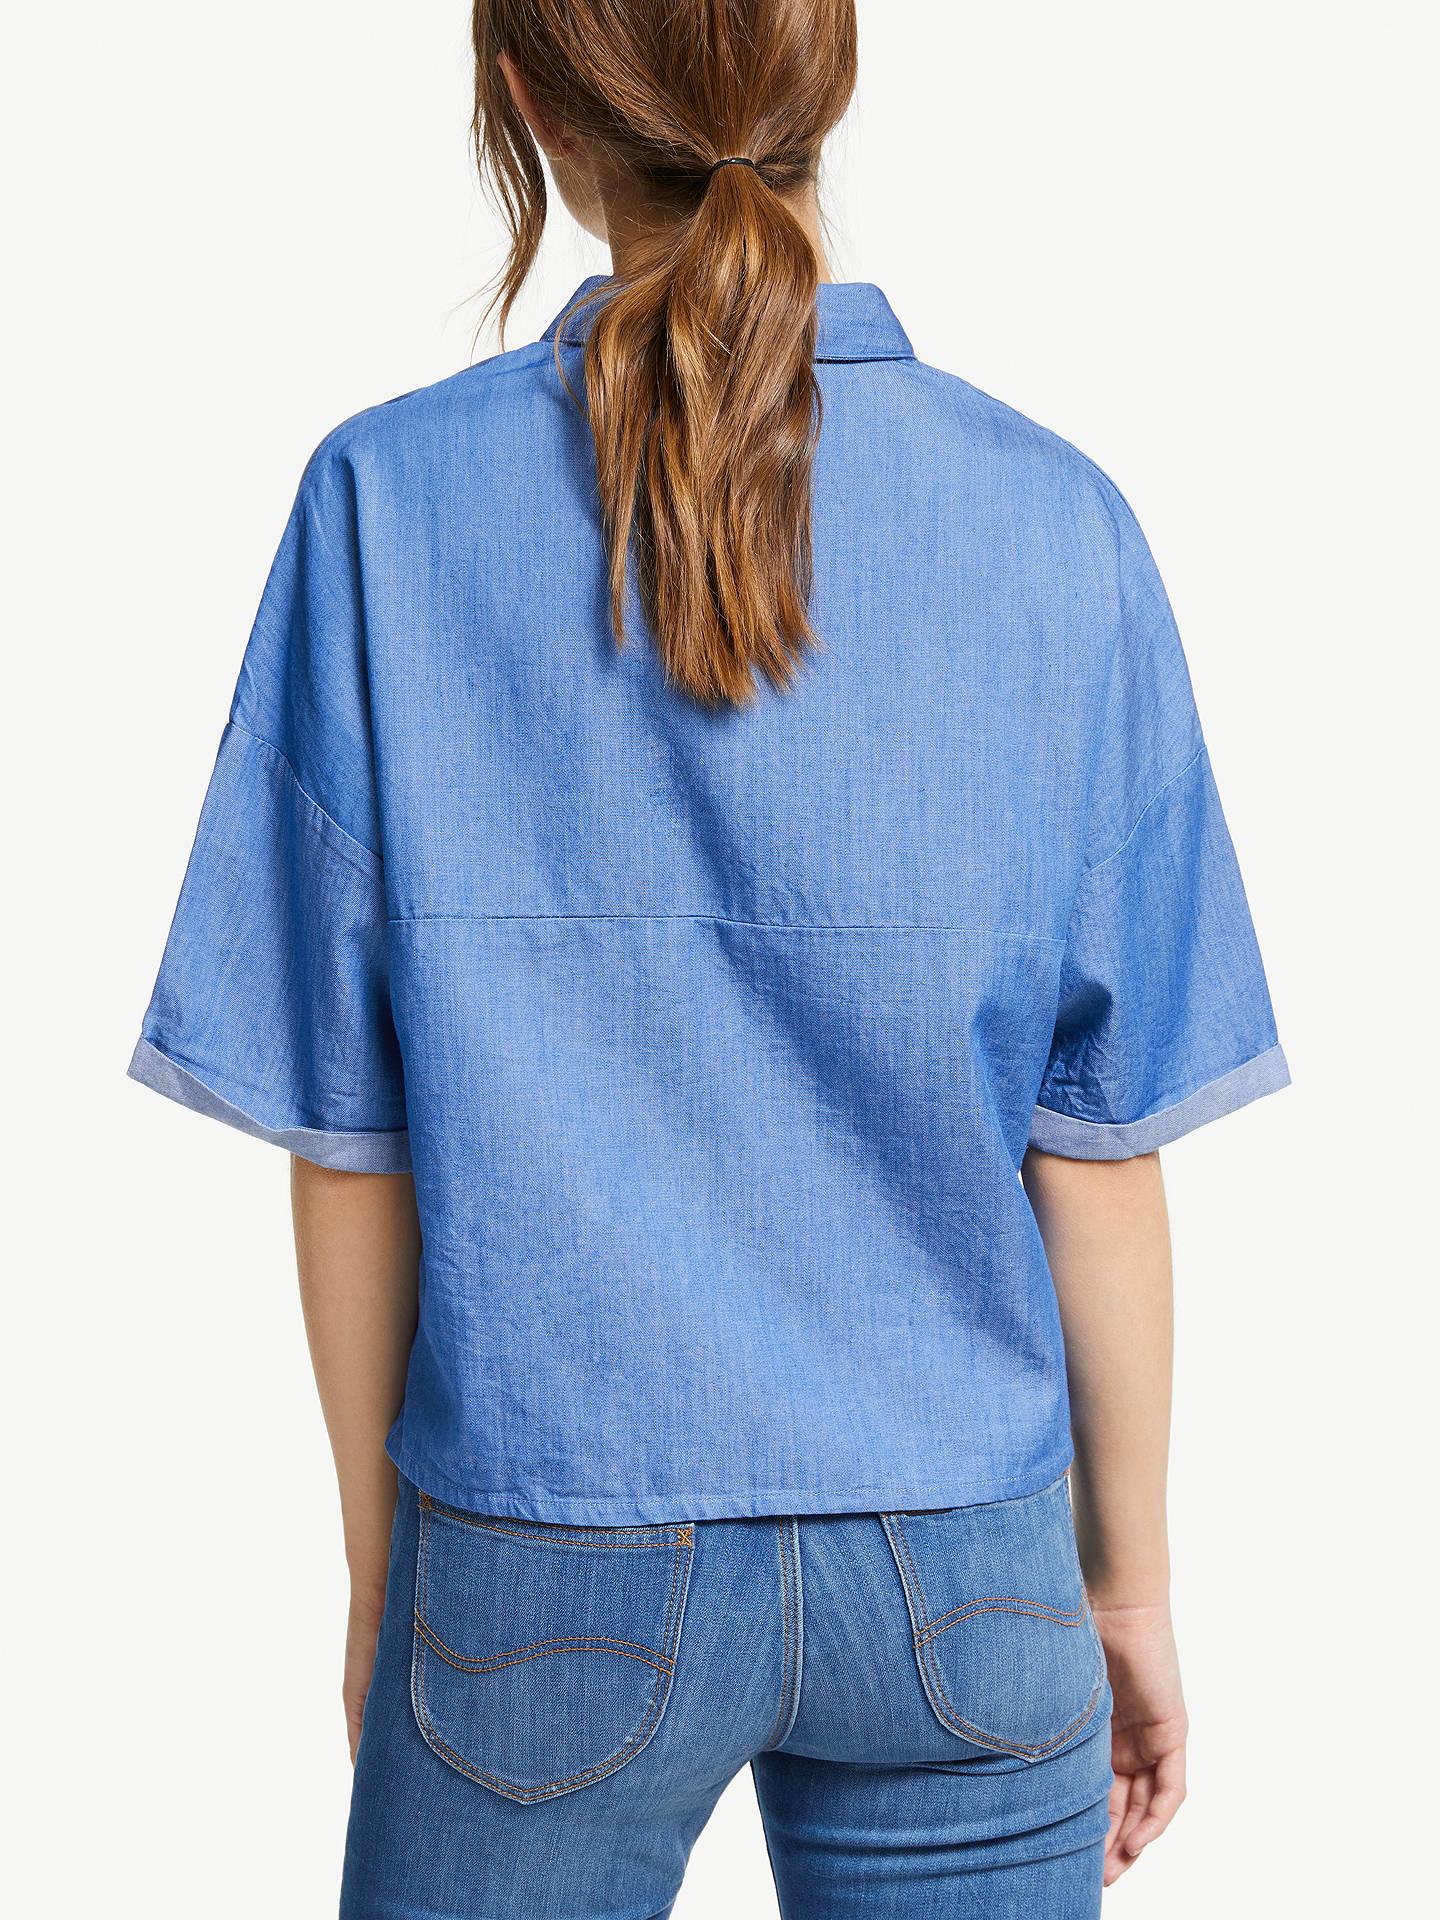 e0e096908f9ceb ... Buy Lee Cropped Denim Shirt, Dipped Blue, S Online at johnlewis.com ...